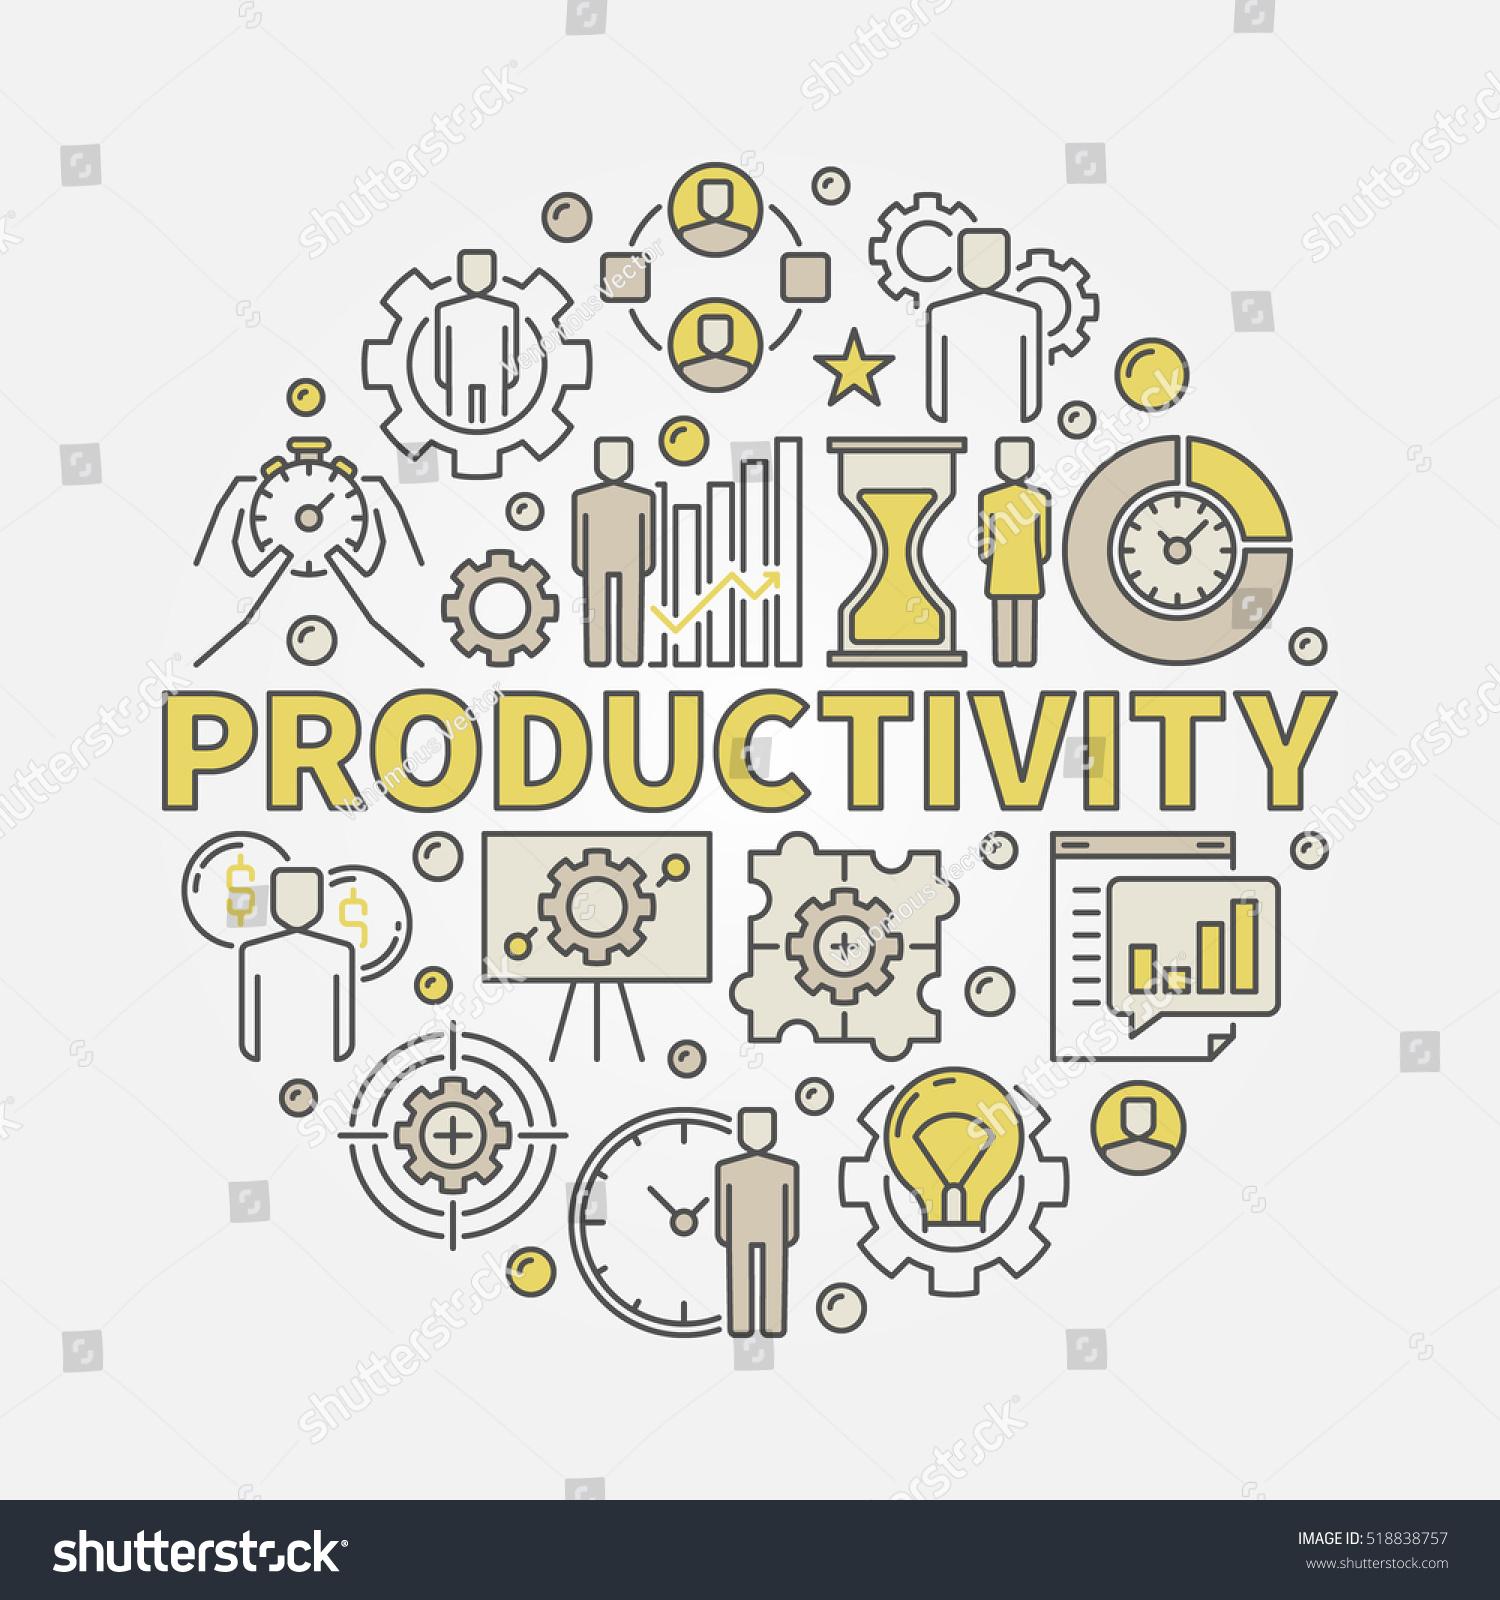 Productivity round colorful illustration vector flat stock vector productivity round colorful illustration vector flat concept symbol made with word productivity and business icons buycottarizona